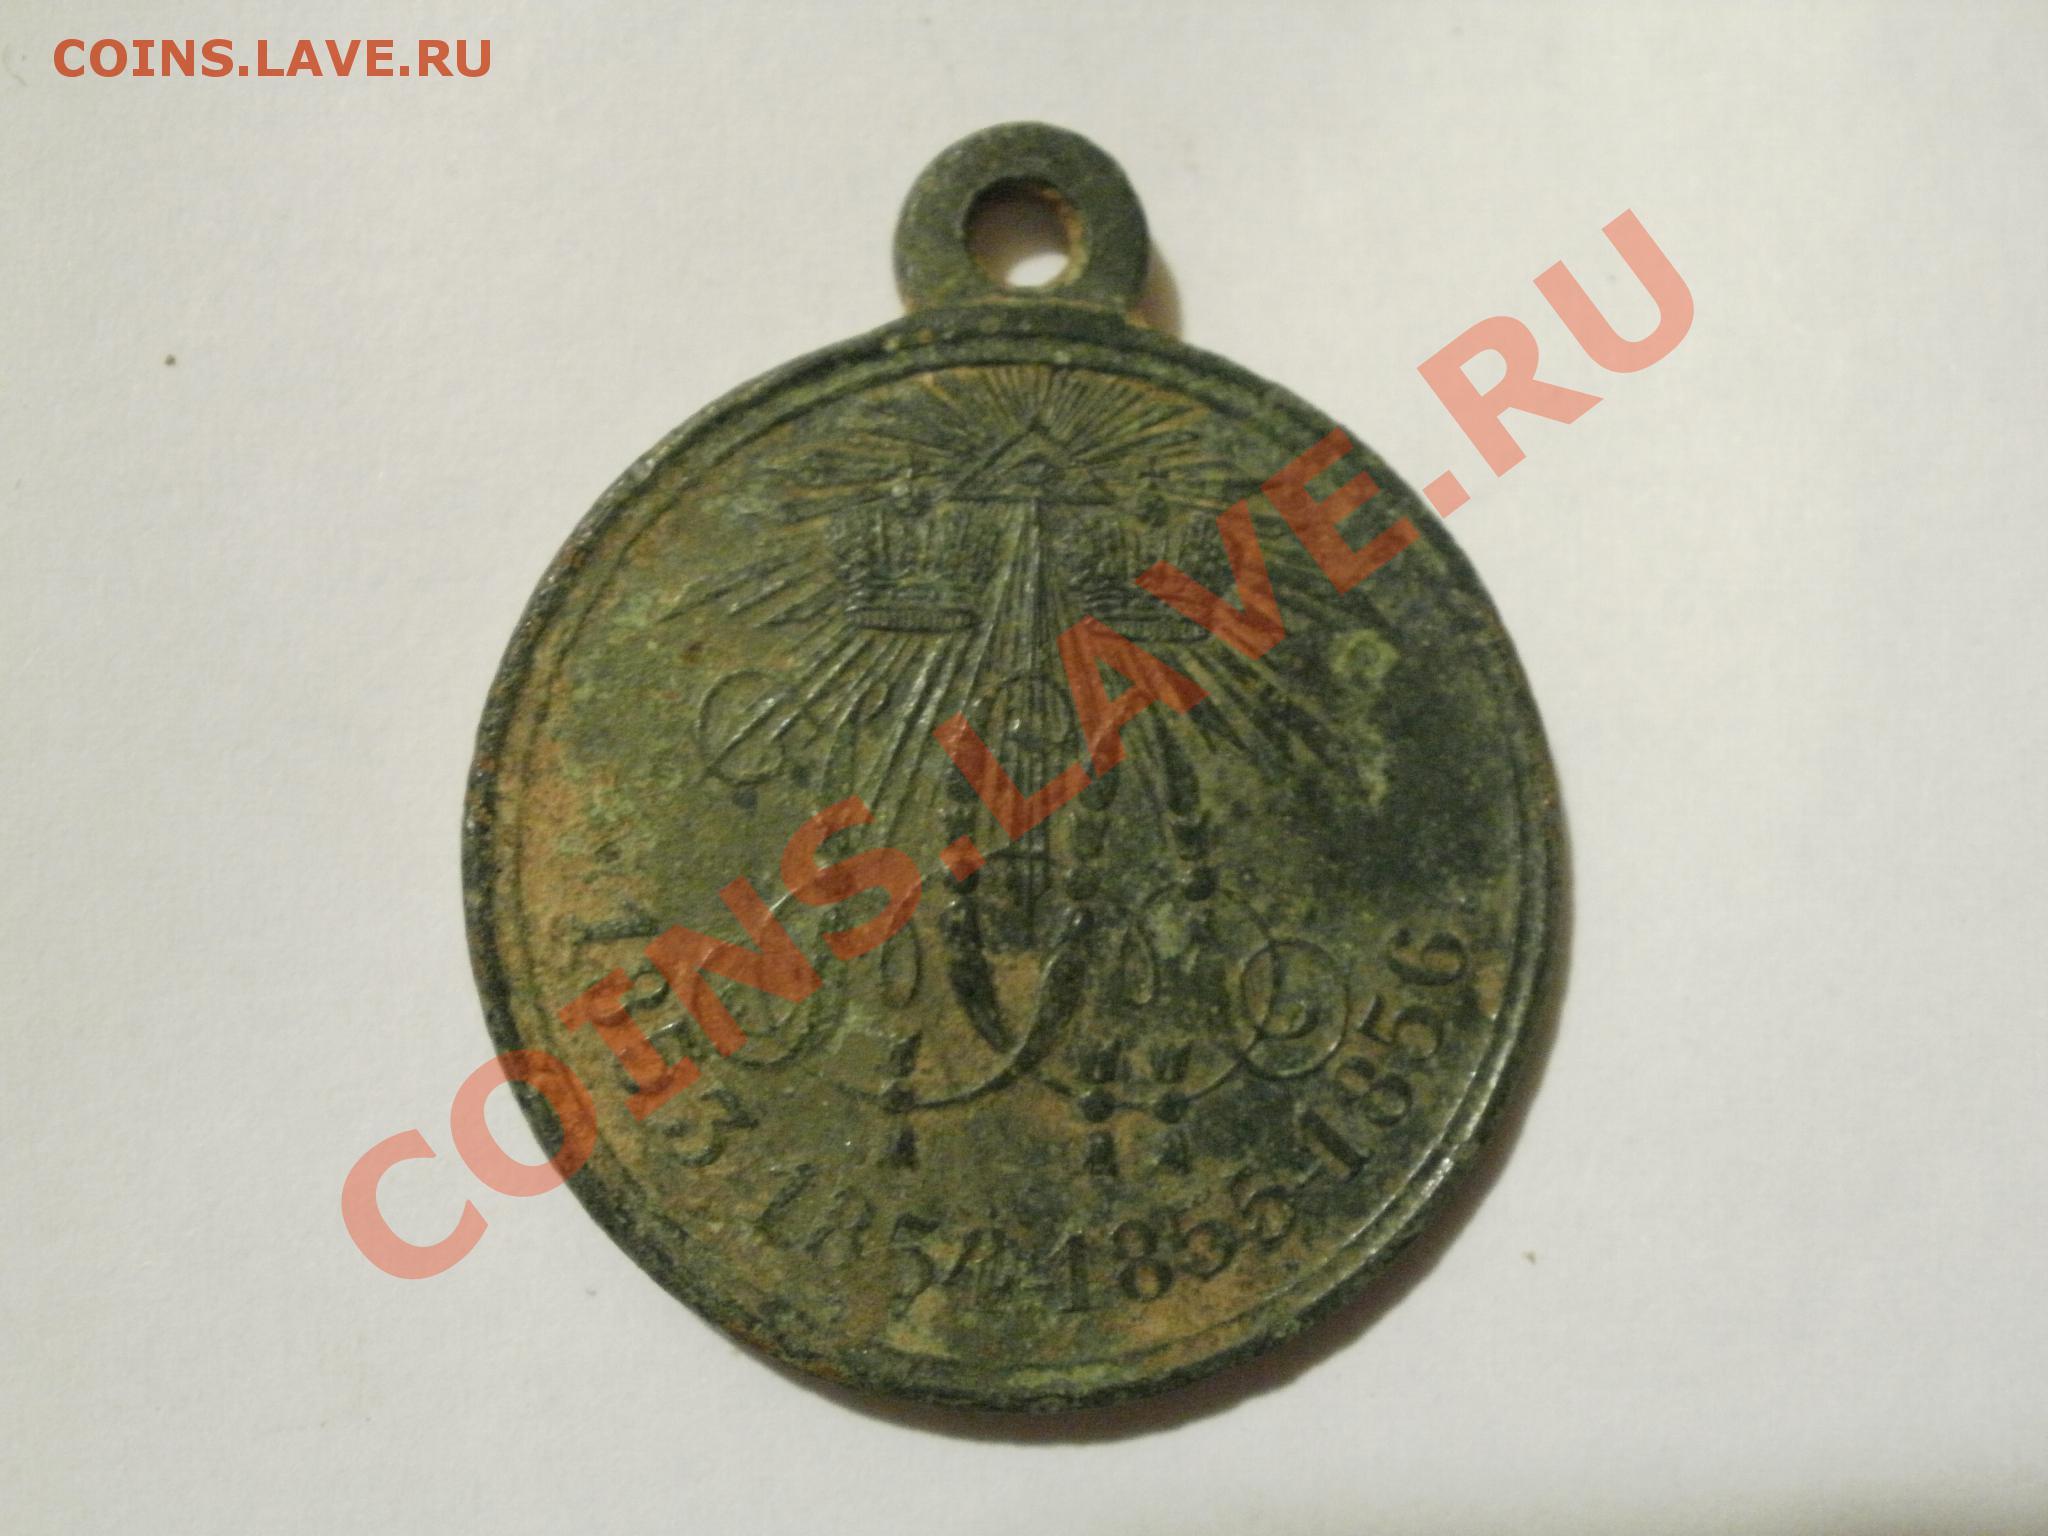 Медаль память (крымской) войны 1853-1856гг.до4.11.10 22.00мс.